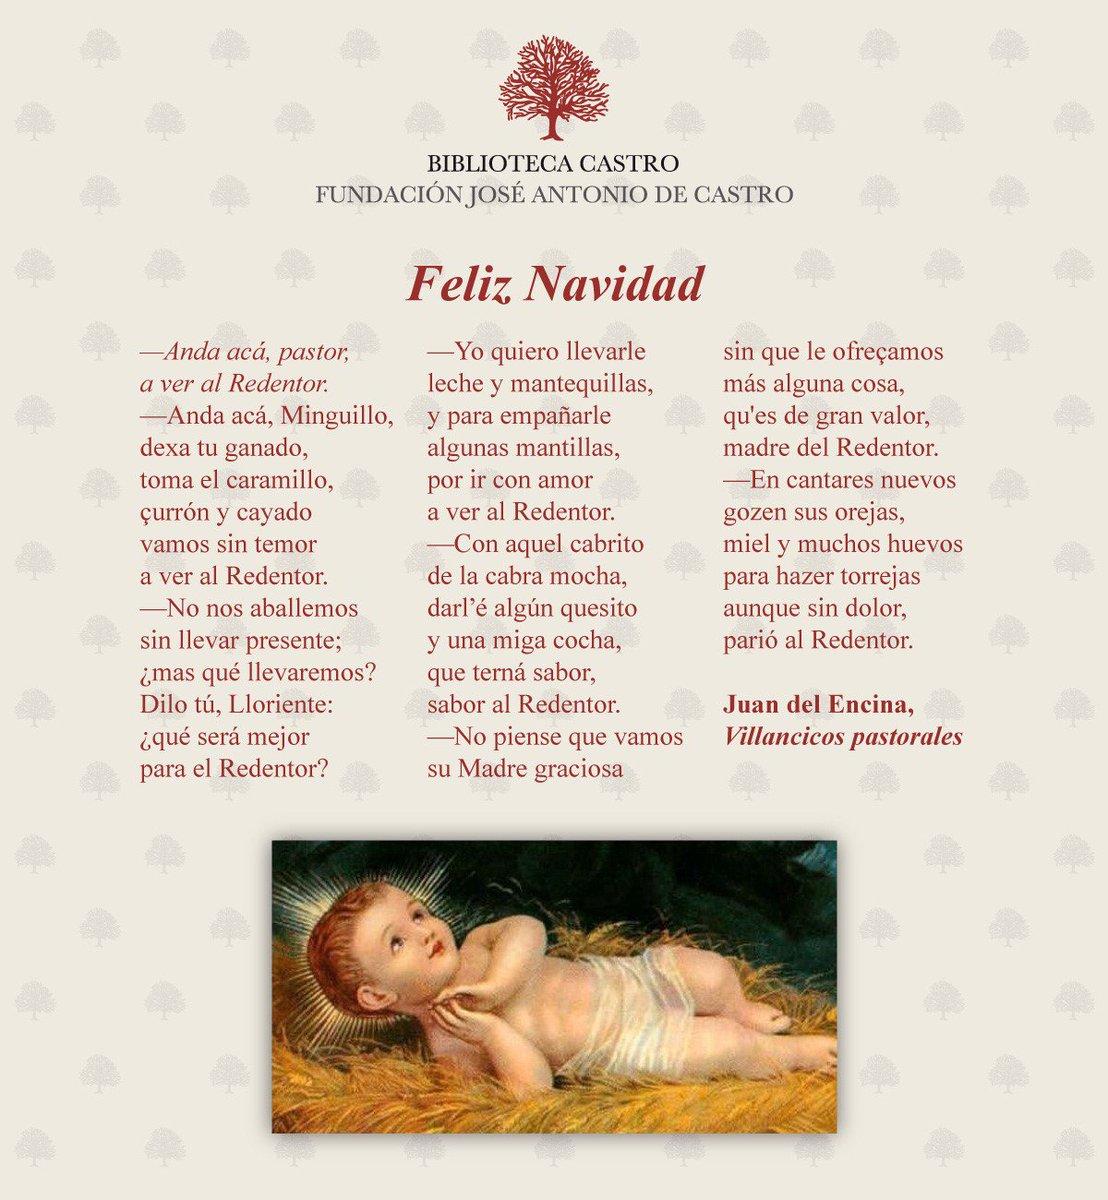 test Twitter Media - Desde la Biblioteca Castro, os deseamos una Feliz Navidad. https://t.co/21YMwu2zDv